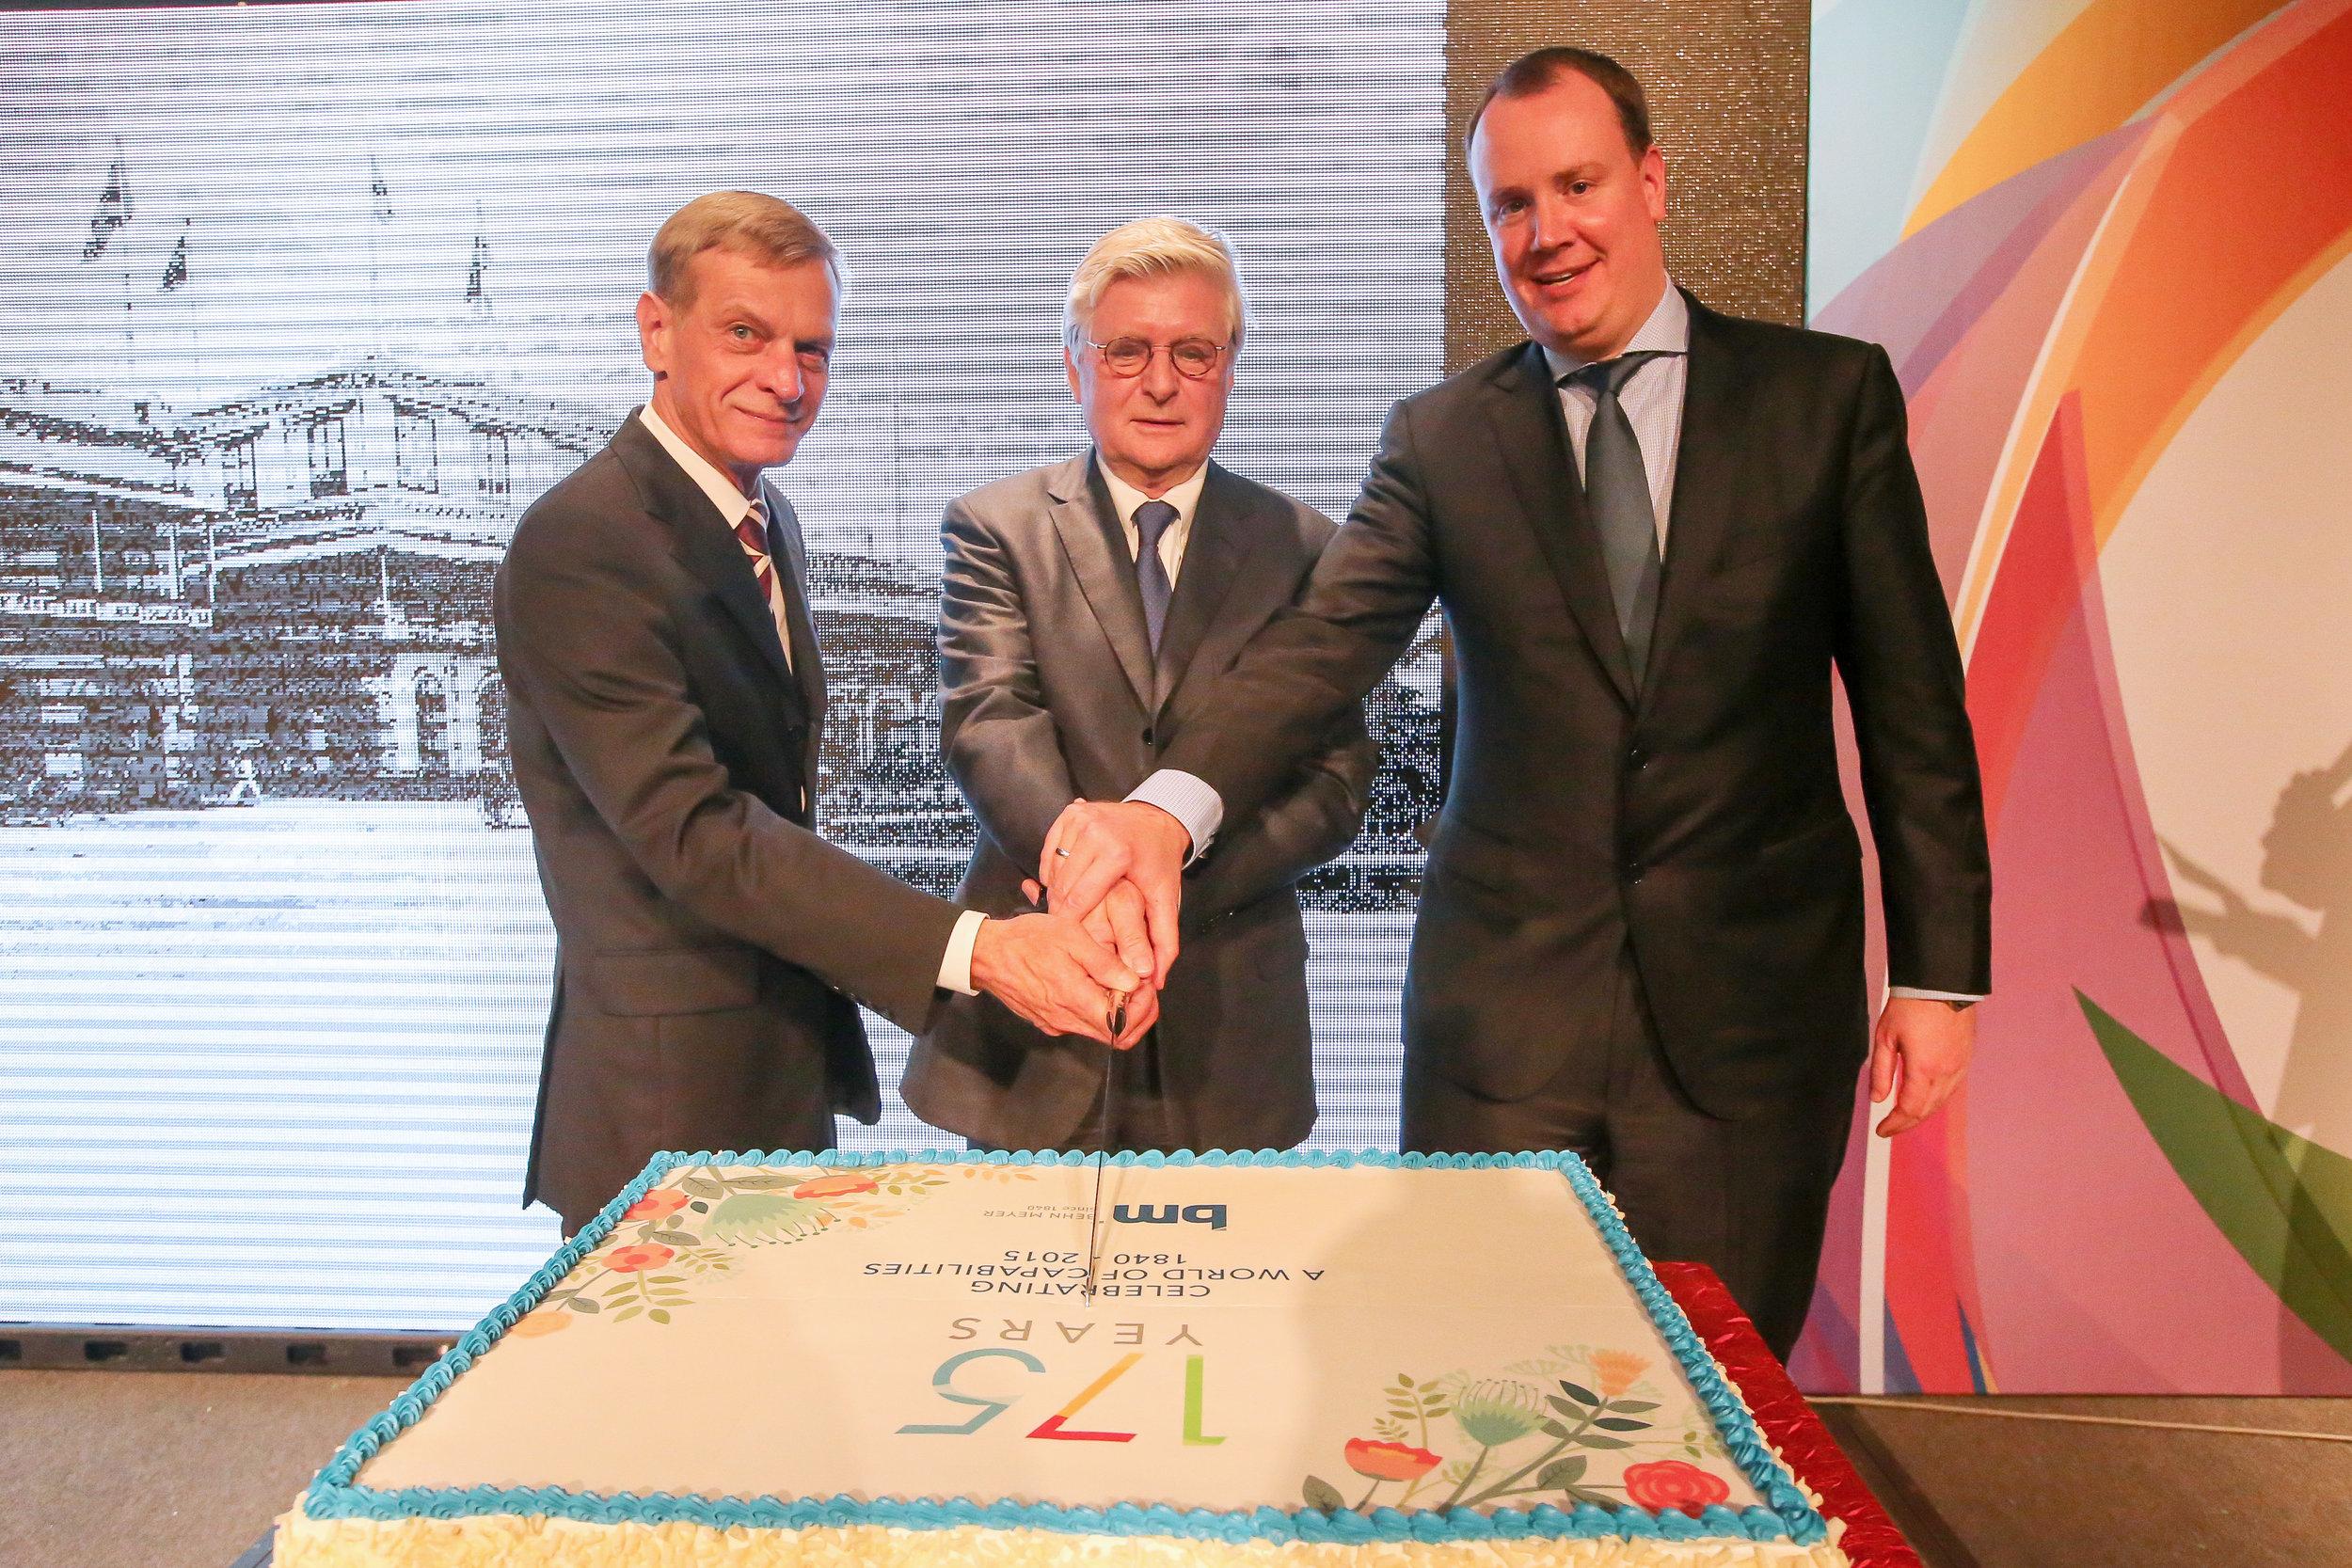 performance-additives-behn-meyer-175th-anniversary-cake-cutting.jpg